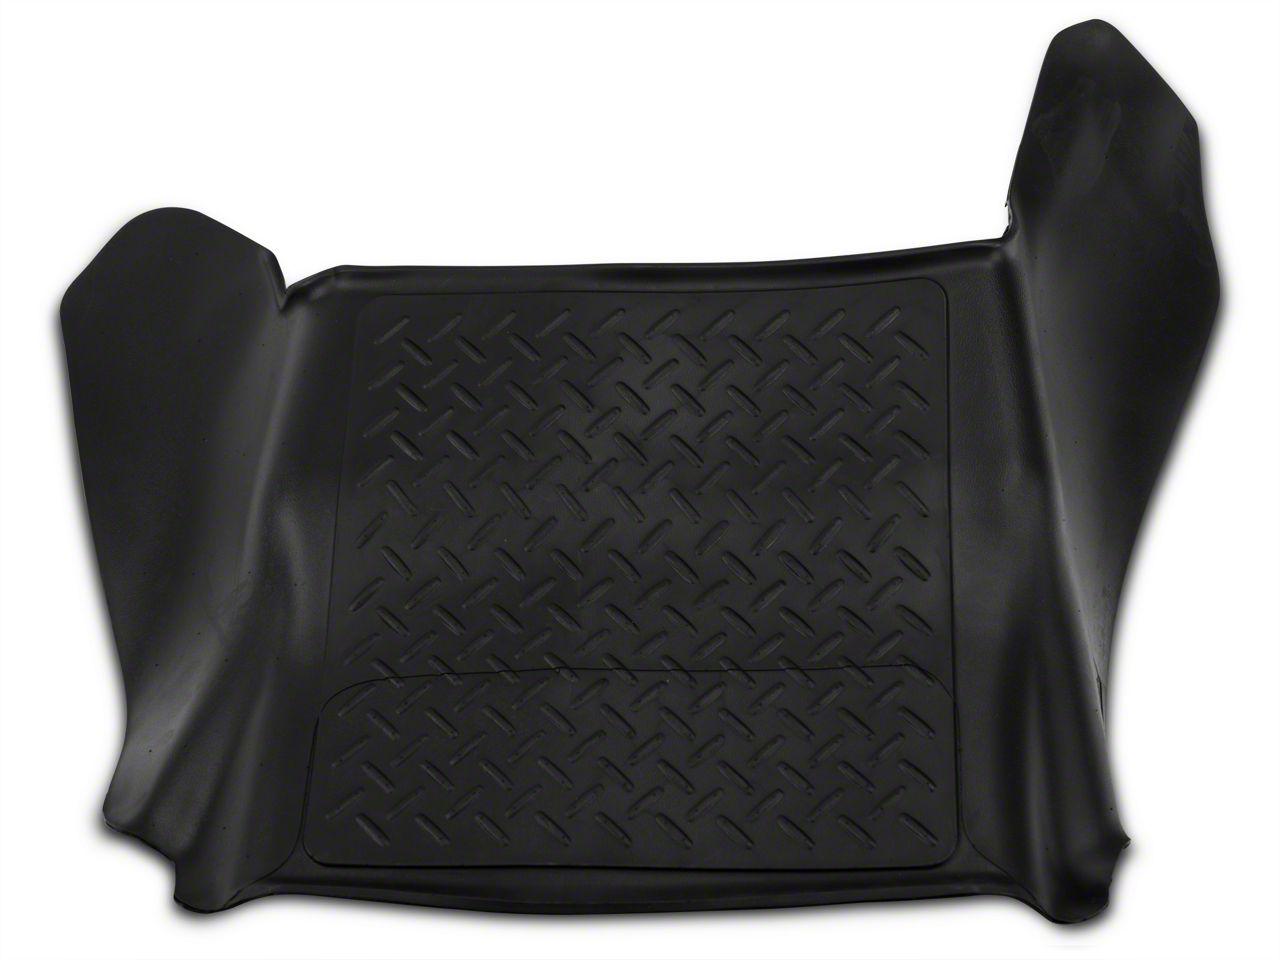 Husky Weatherbeater Center Hump Floor Liner - Black (09-14 F-150)